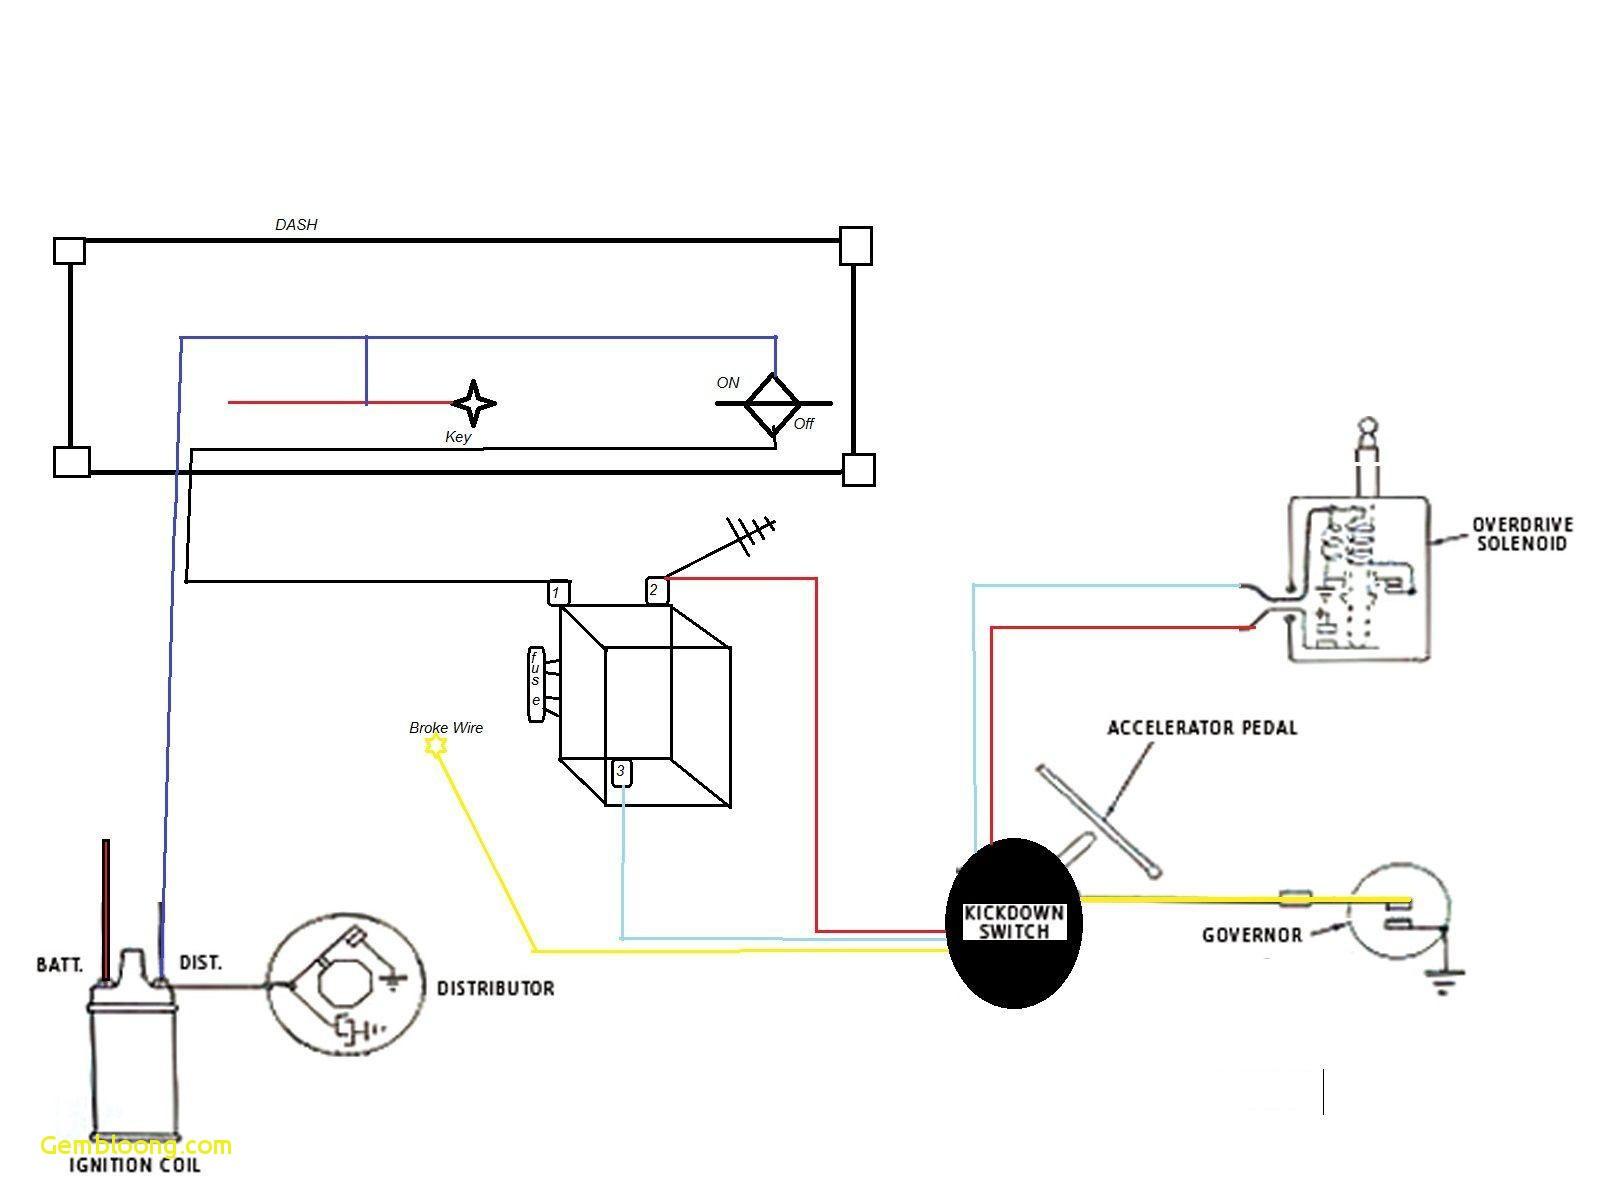 Car Alternator Connection Diagram Download ford Trucks Wiring Diagrams Audi A4 Alternator Wiring Of Car Alternator Connection Diagram